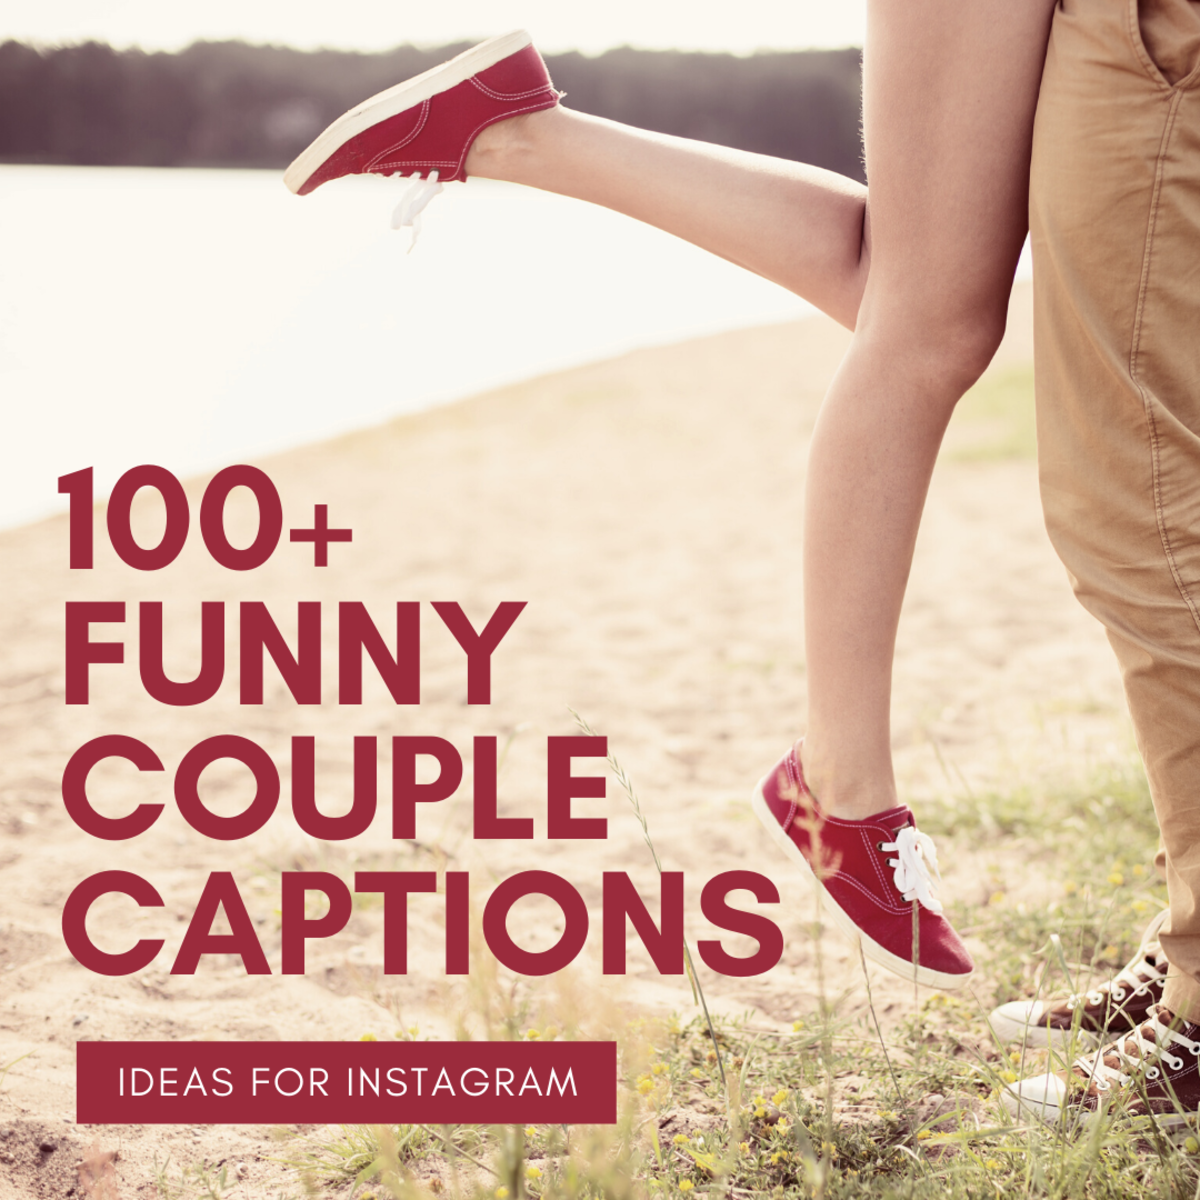 Make your friends laugh out loud!